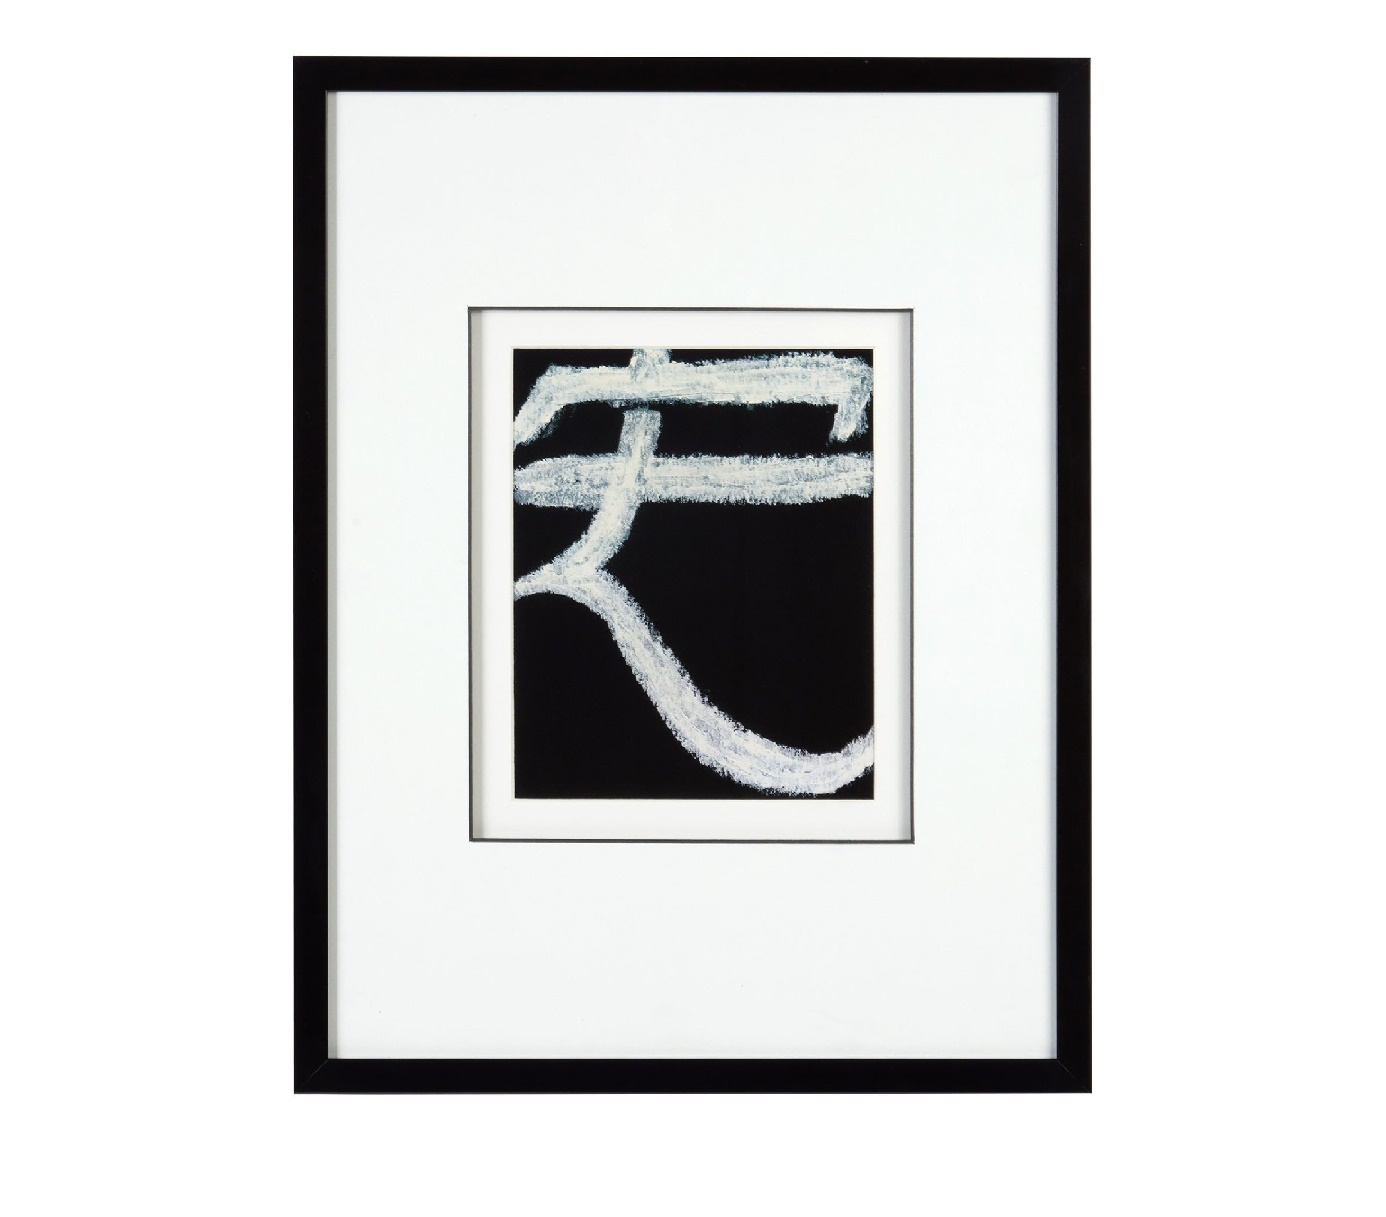 Постер M-Style 15437915 от thefurnish